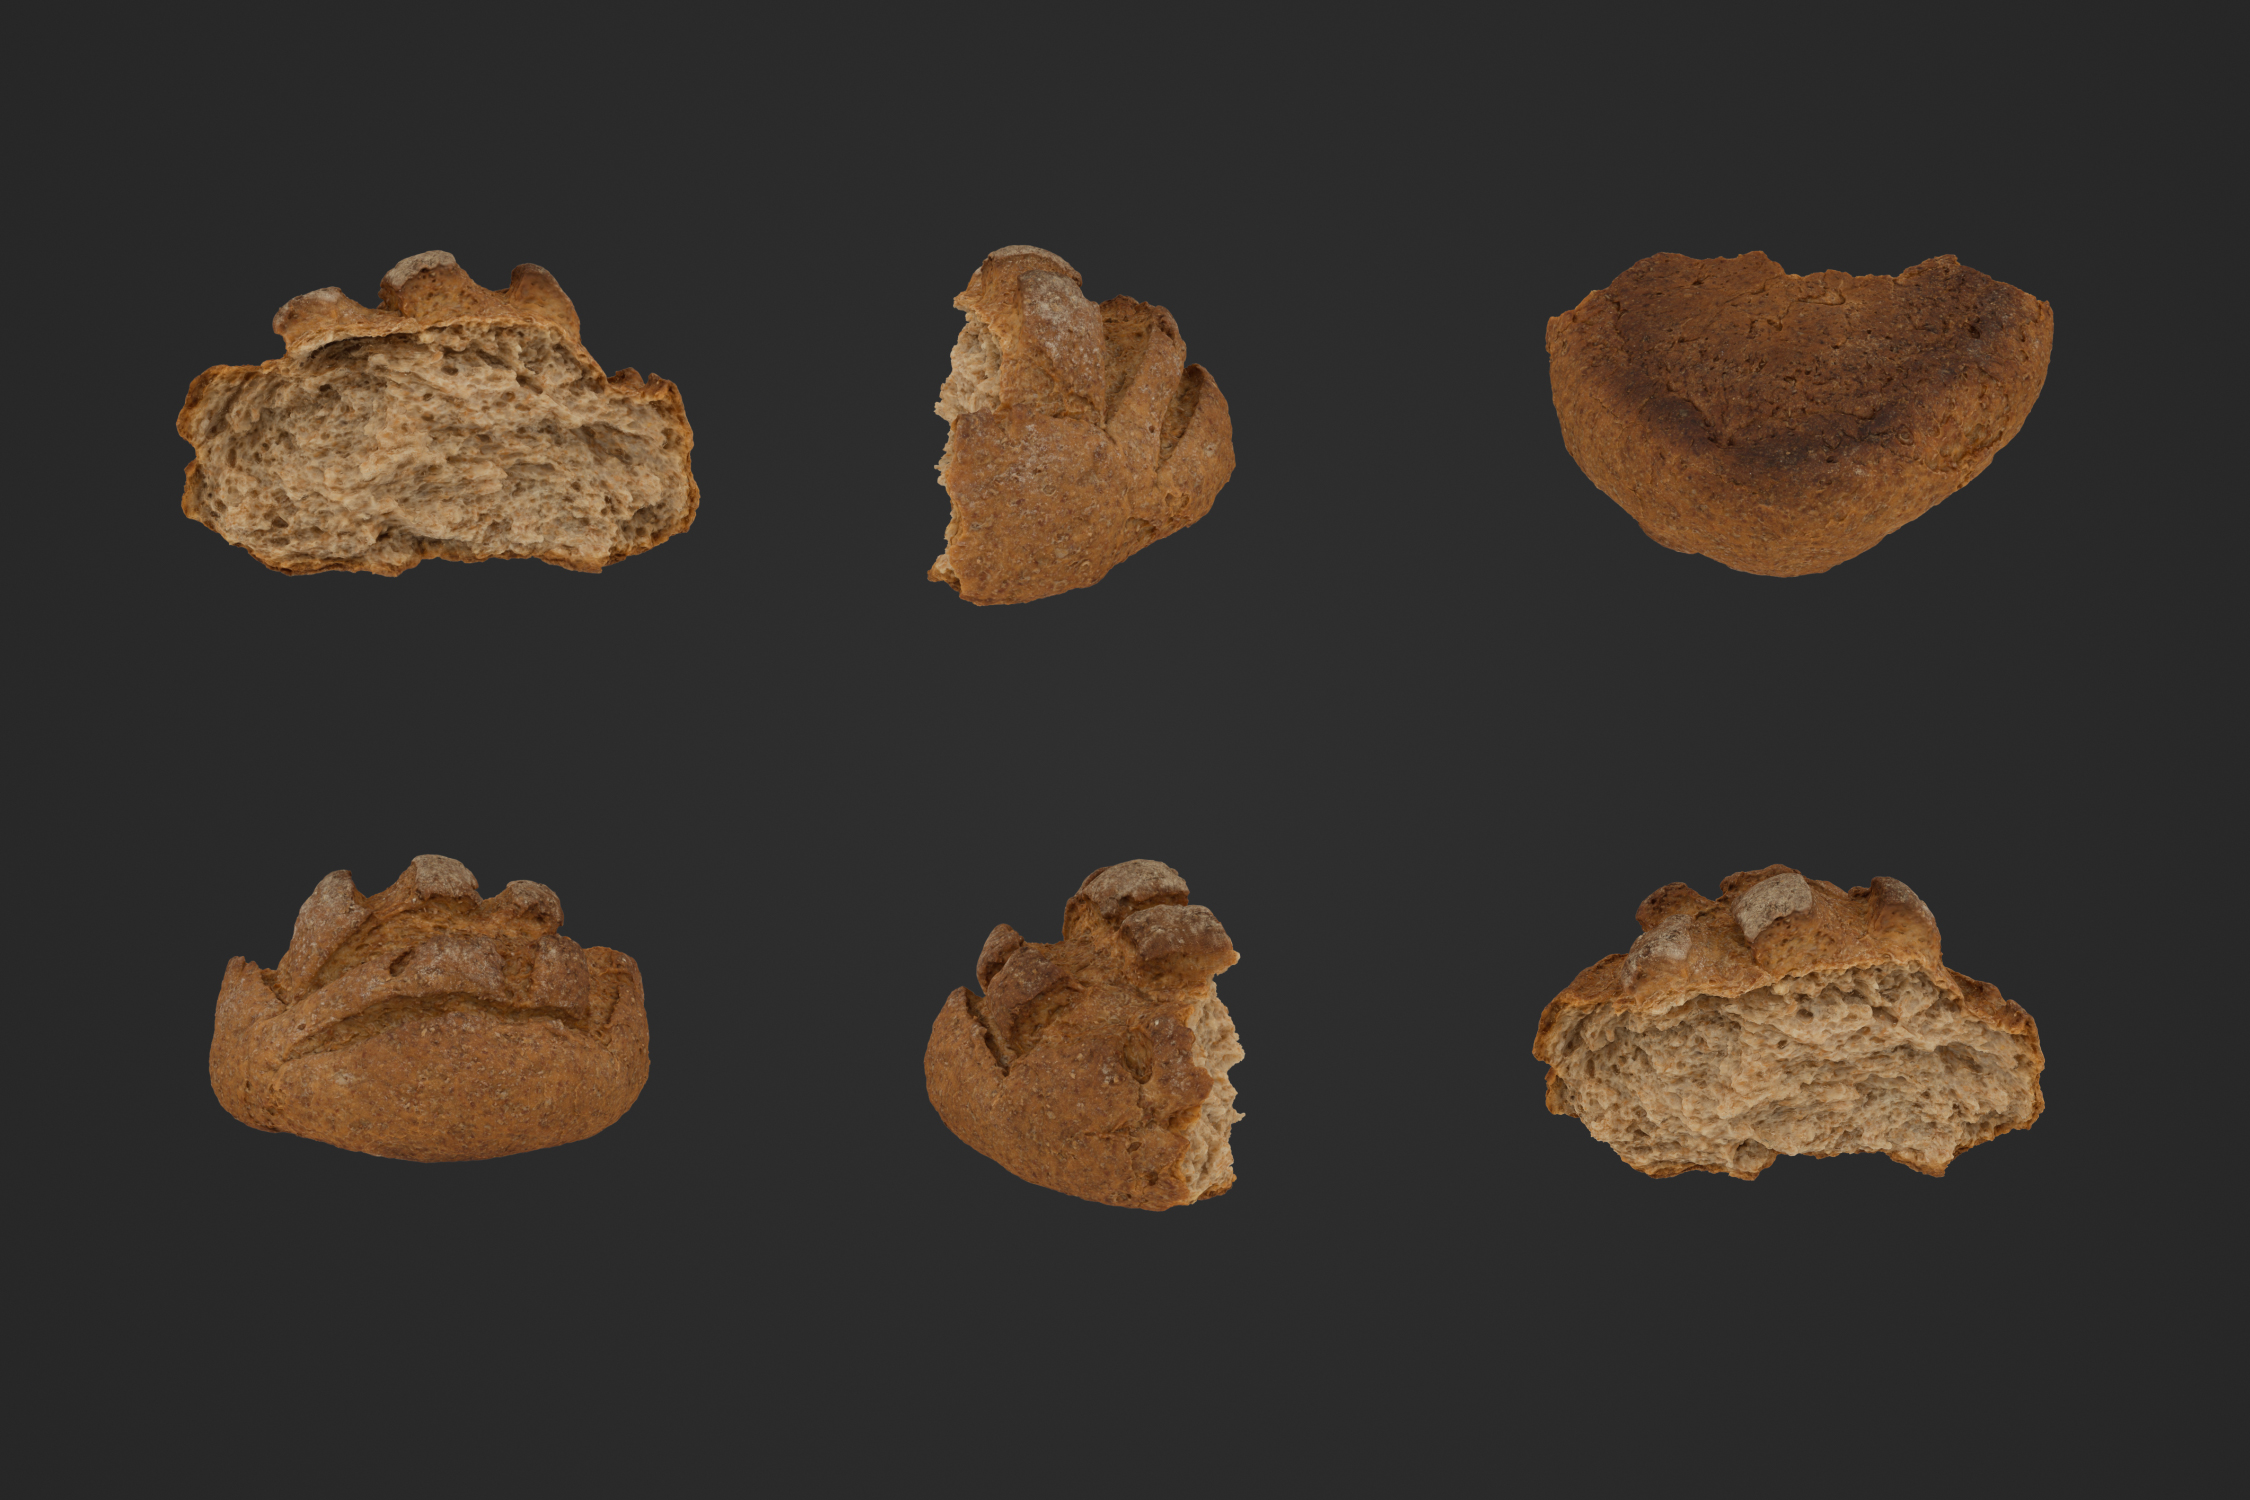 Half_Large_Bread_Roll_1.jpg